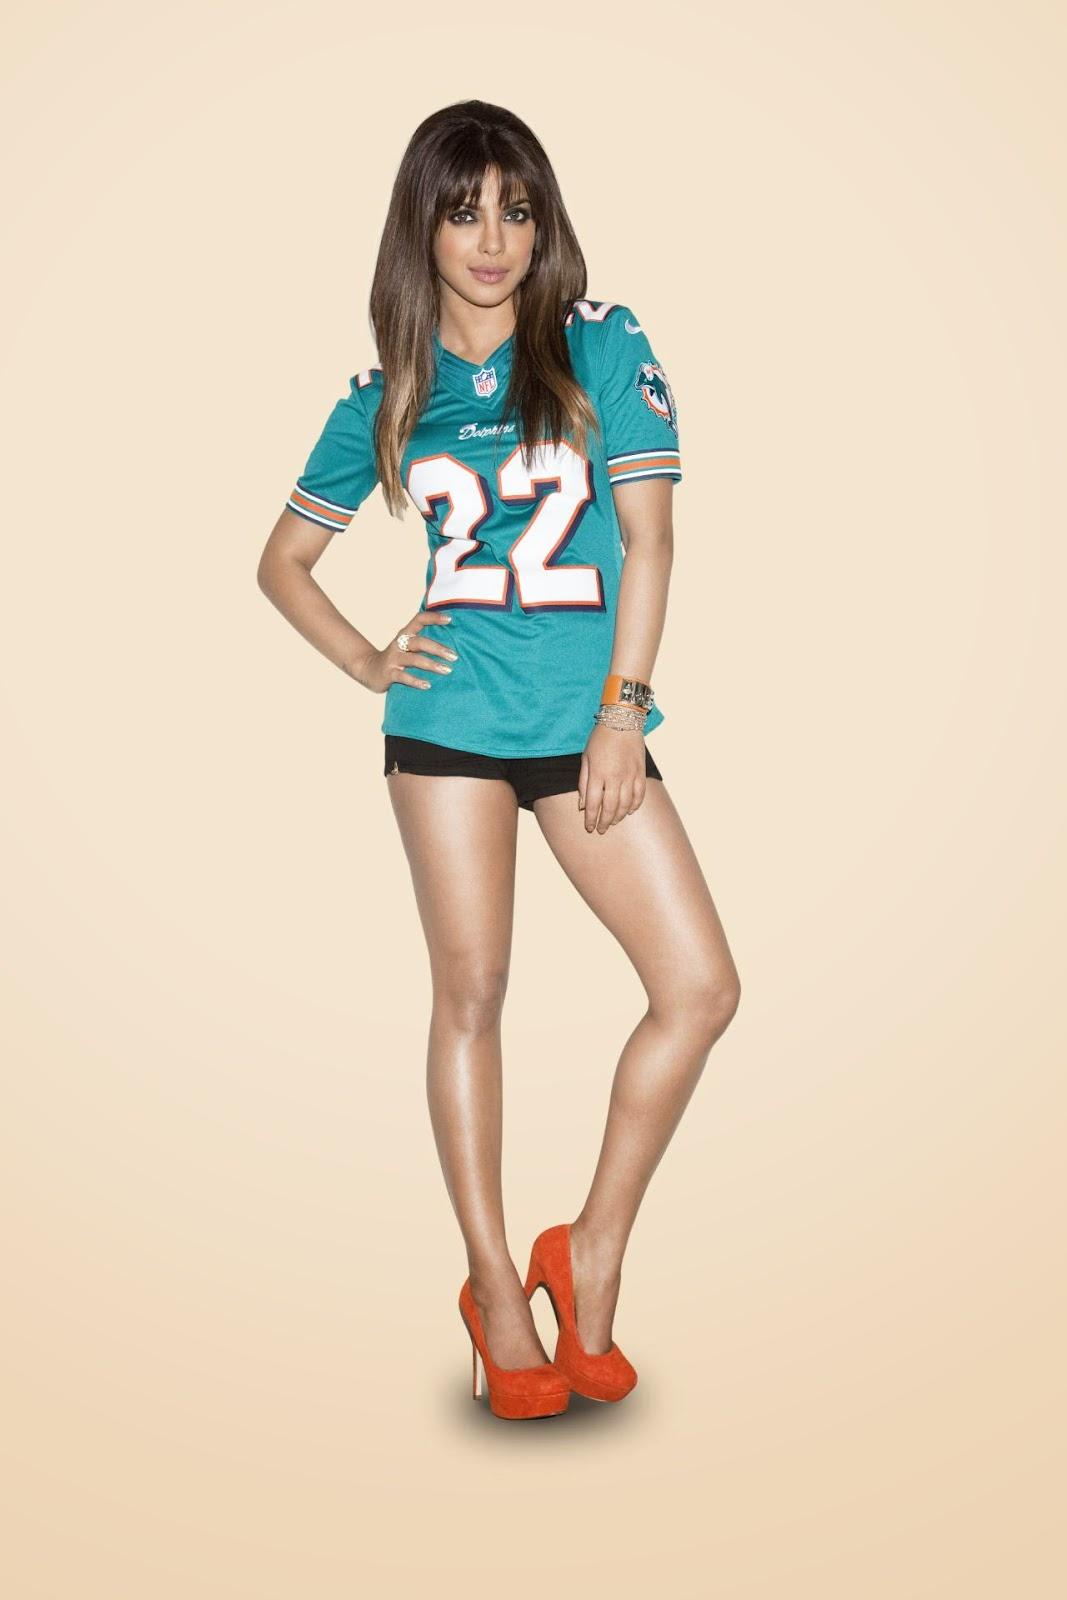 Priyanka Chopra Posing in Blue NFL Jersey